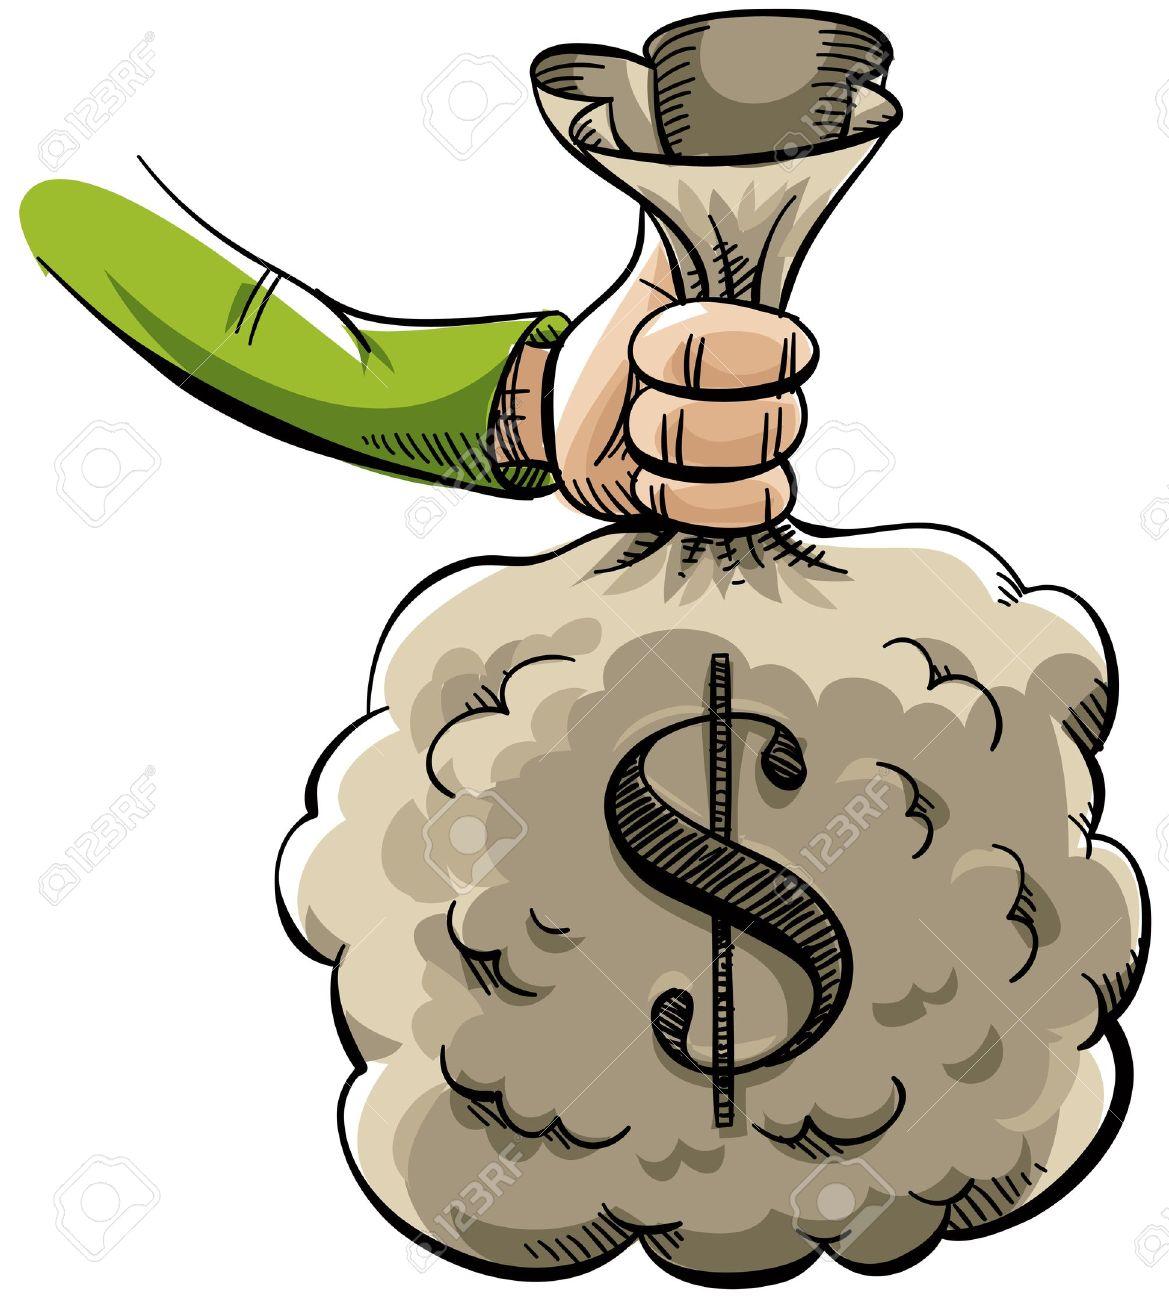 Money Bag Cartoon Clipart